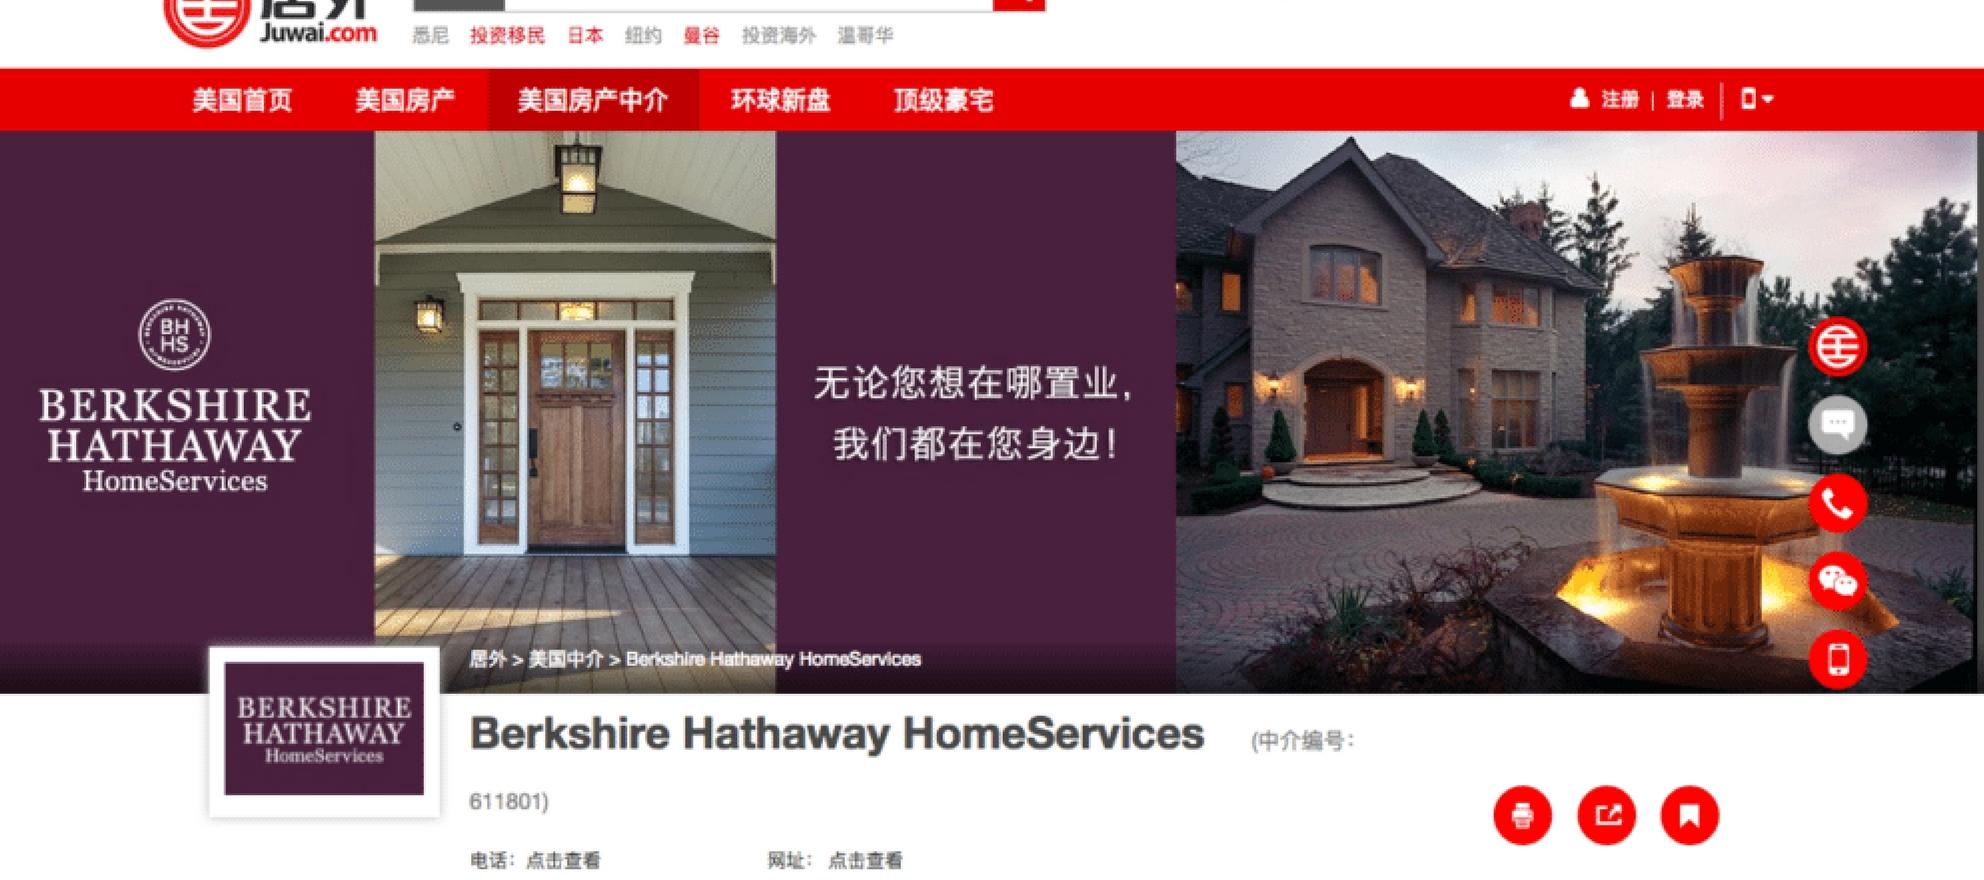 berkshire hathaway homeservices juwai.com partnership